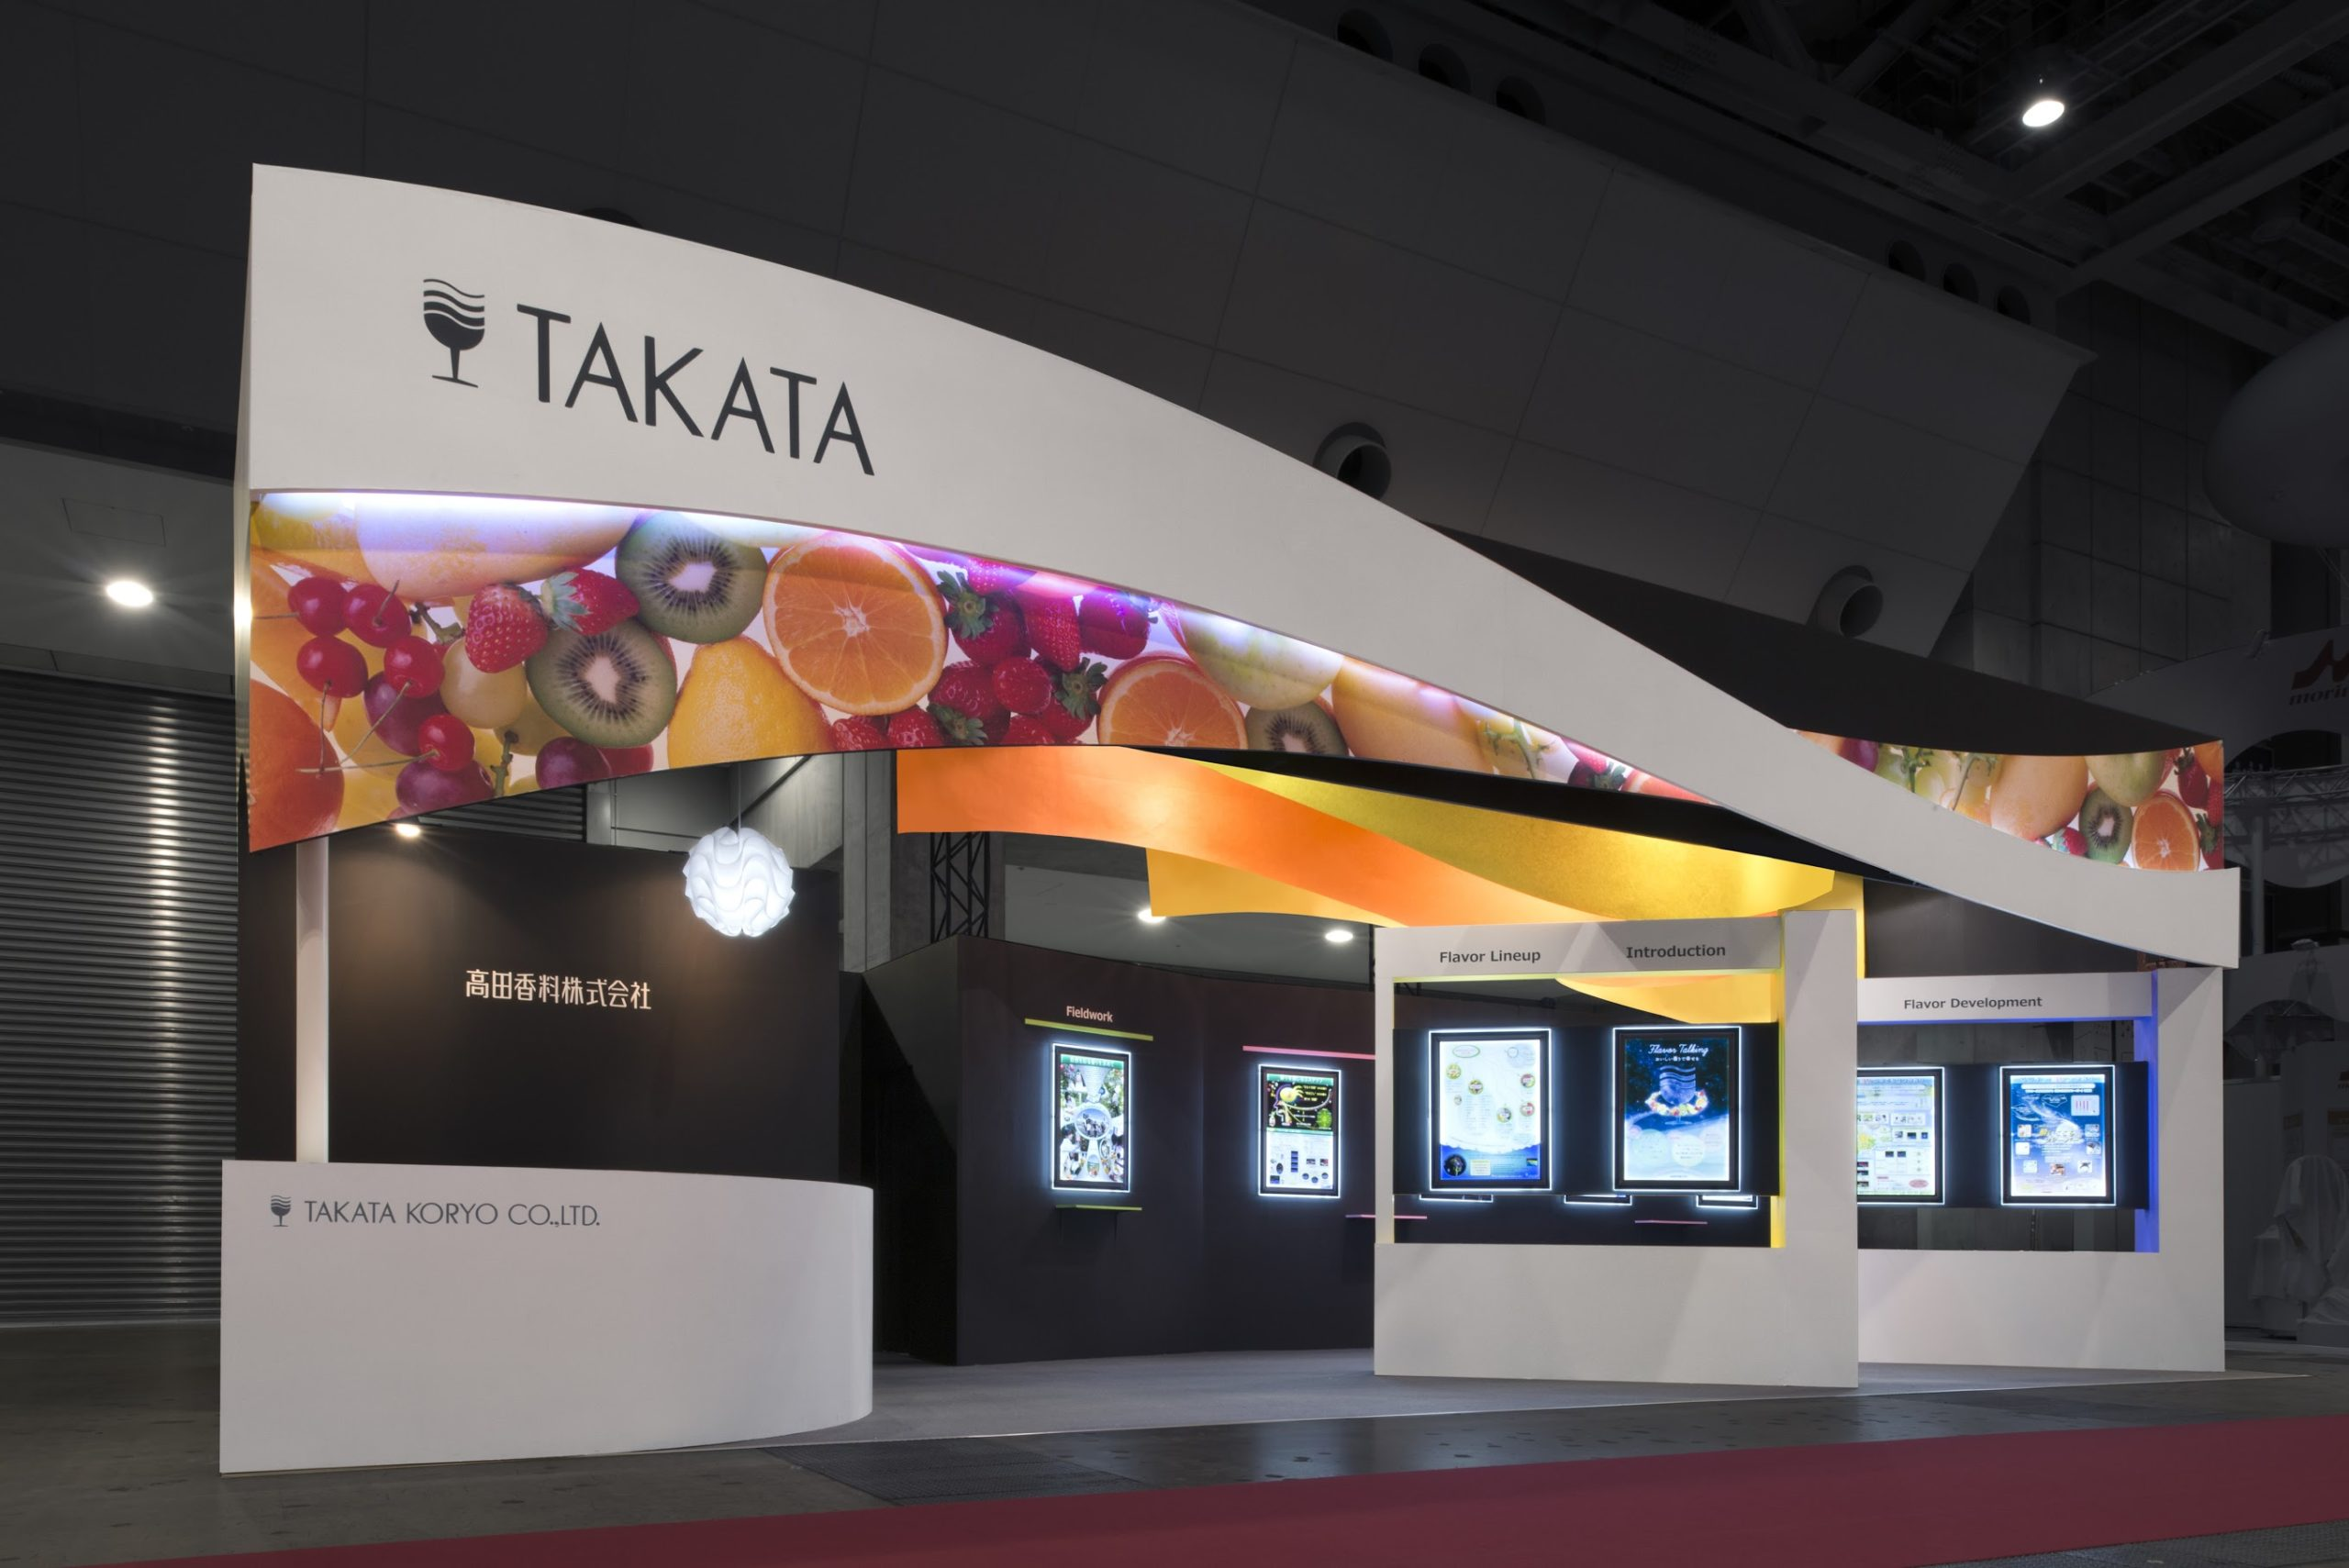 ifia Japan 2015 / TAKATA KORYO Booth